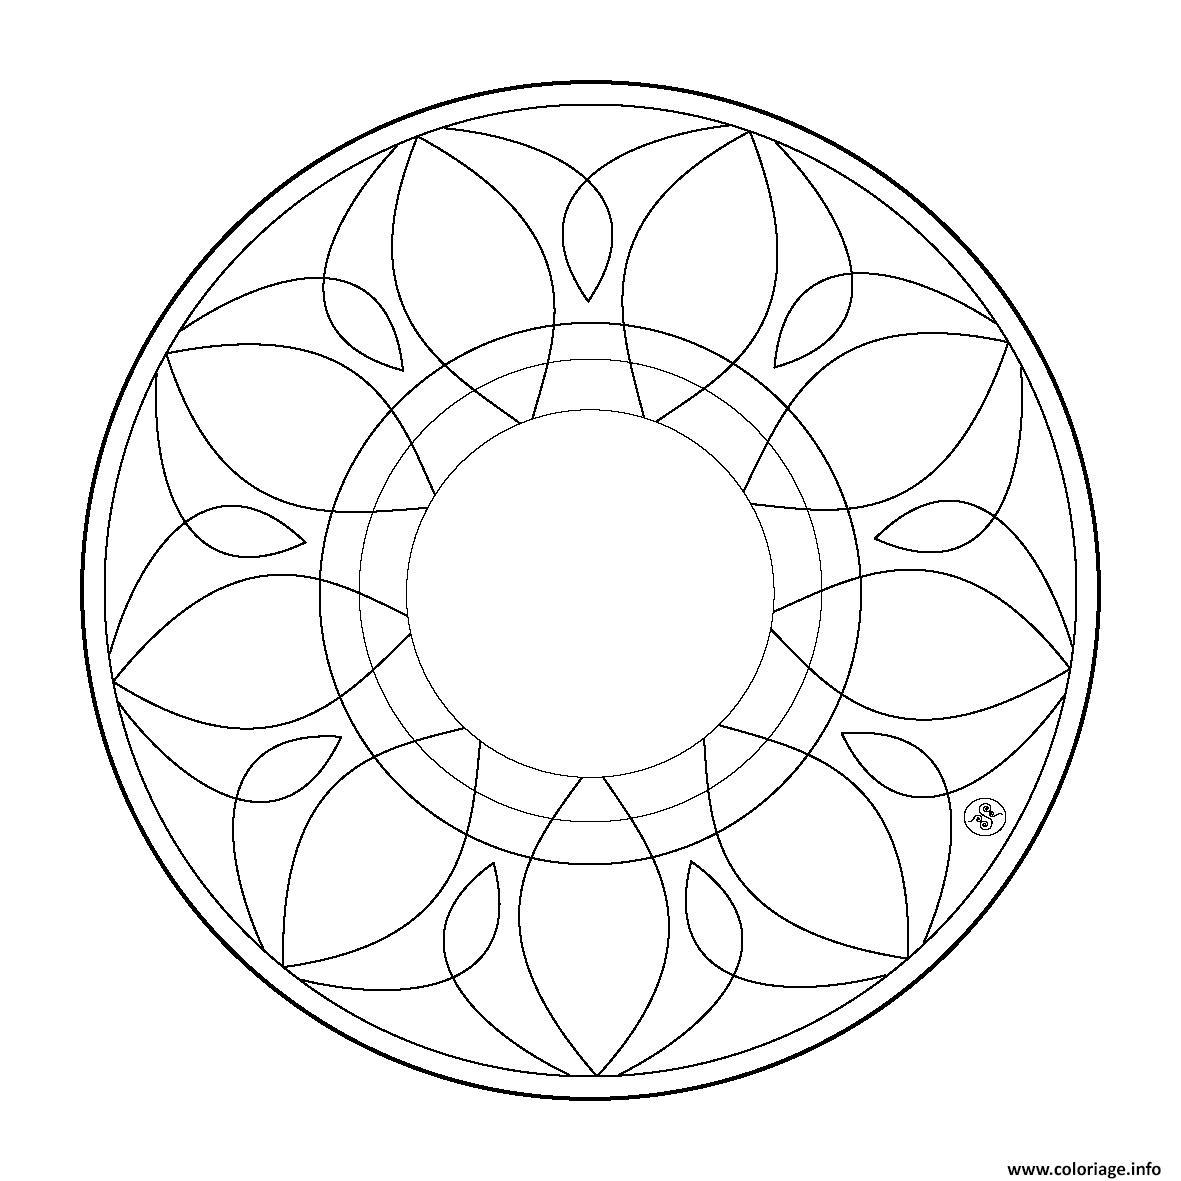 Coloriage Mandala Facile 126 Dessin avec Mandala Facile À Imprimer